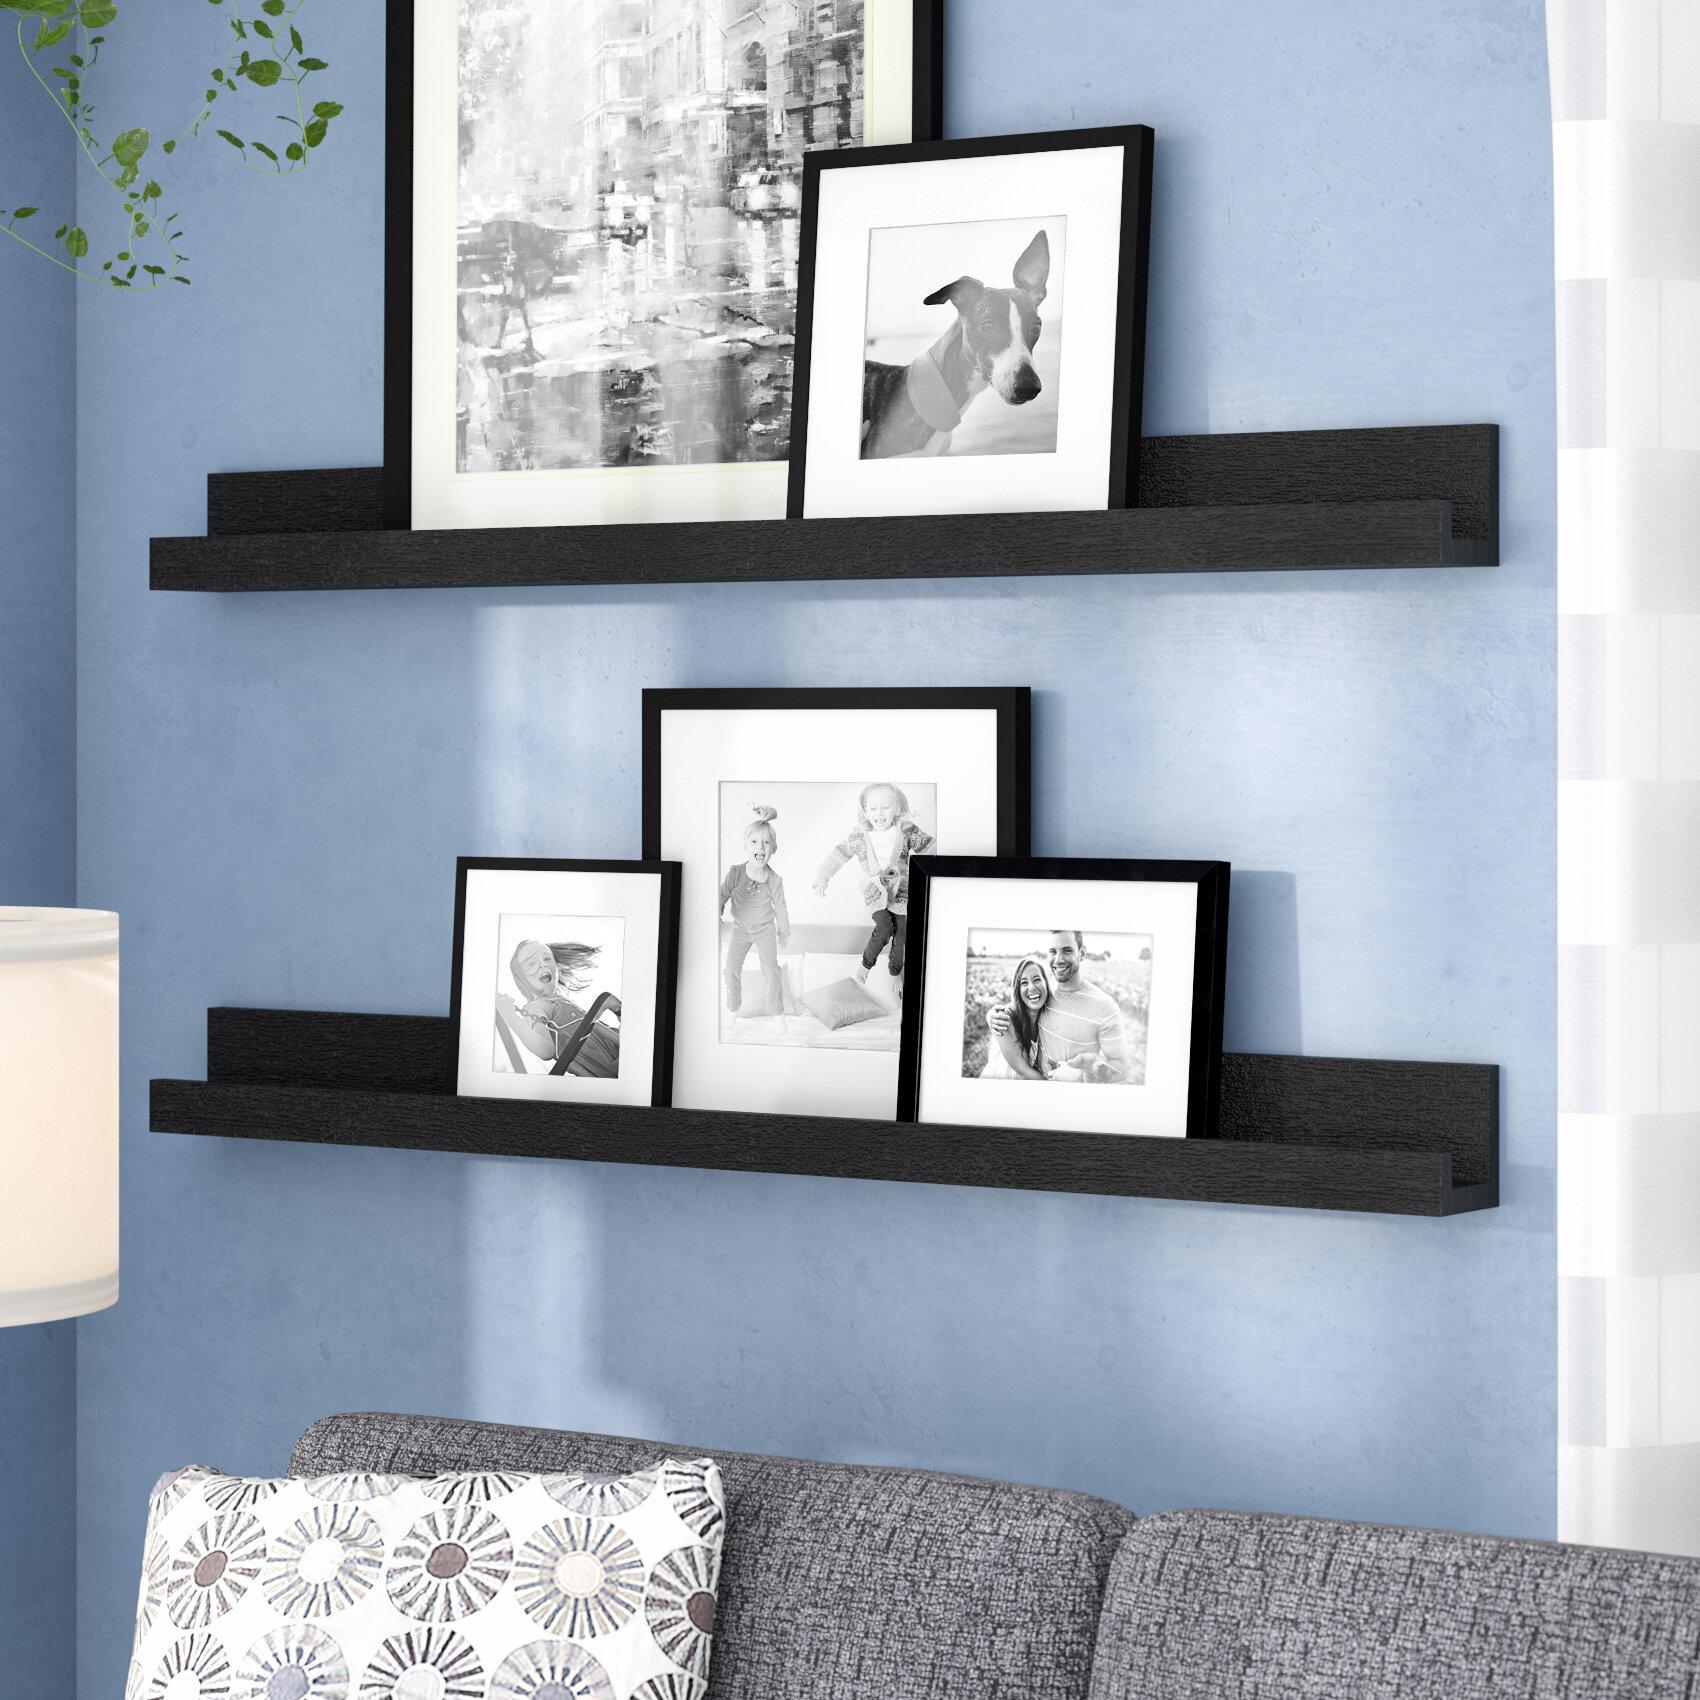 Astounding Dulin Photo Ledge Picture Display Floating Shelf Interior Design Ideas Gentotryabchikinfo